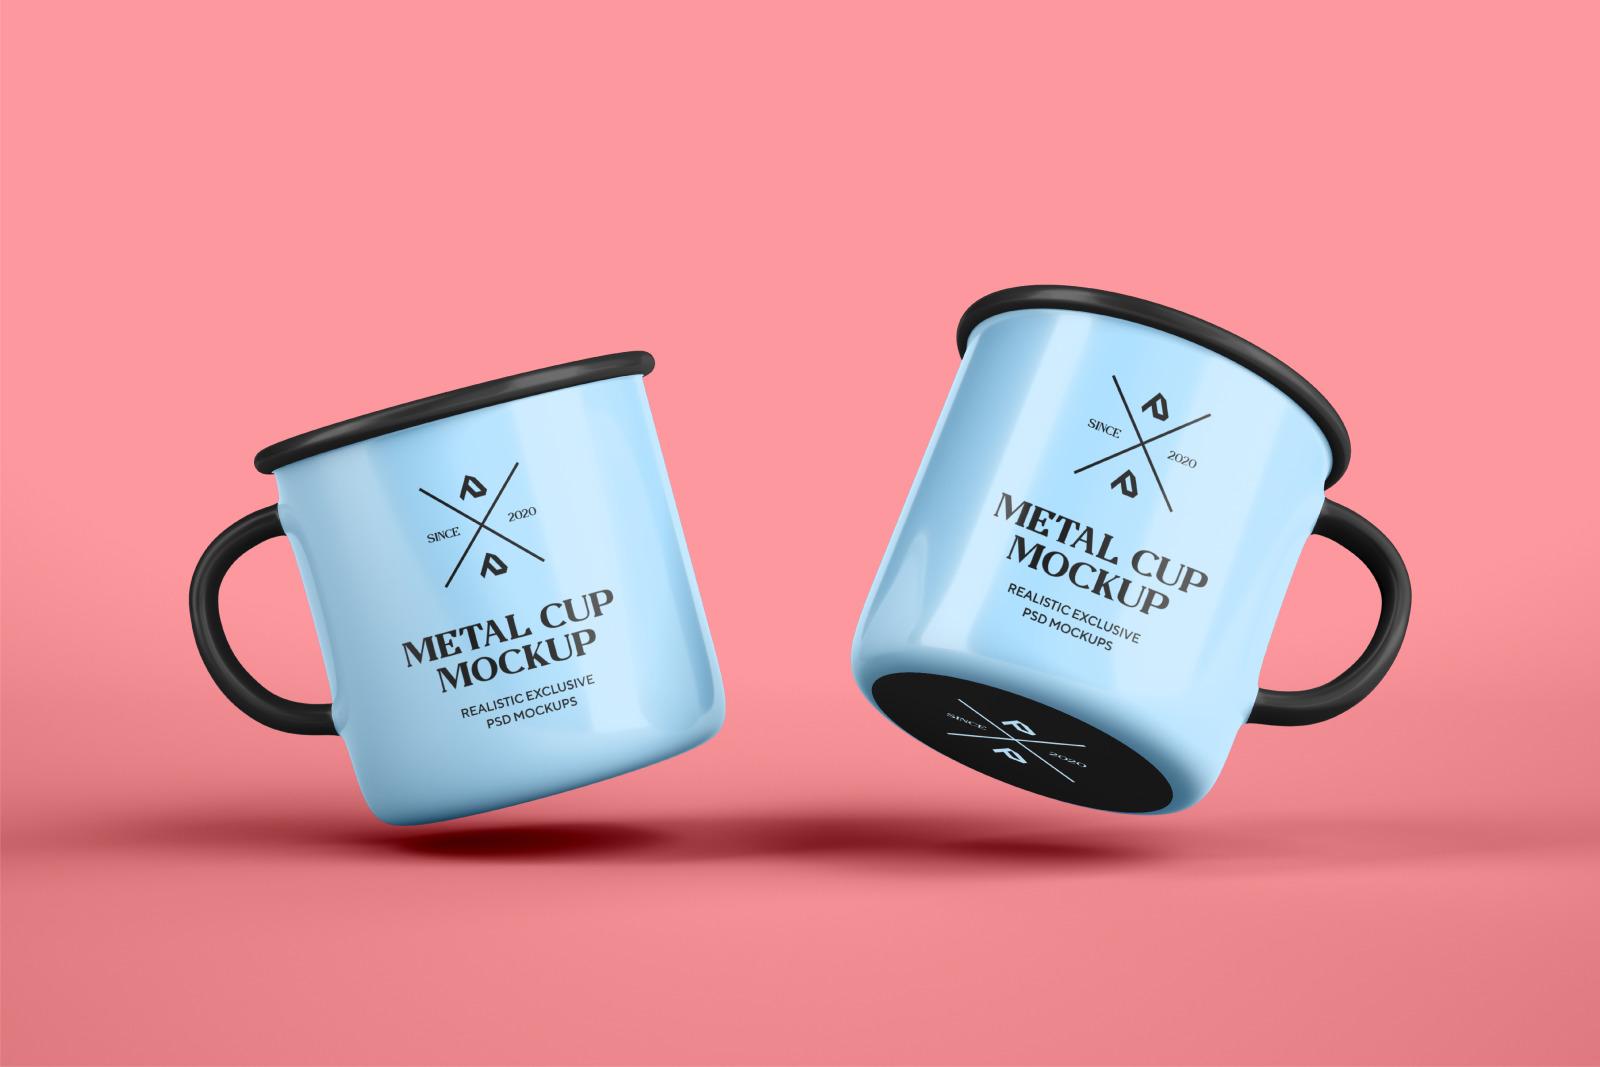 Enamel Mug and Coffee Cup Mockups Set